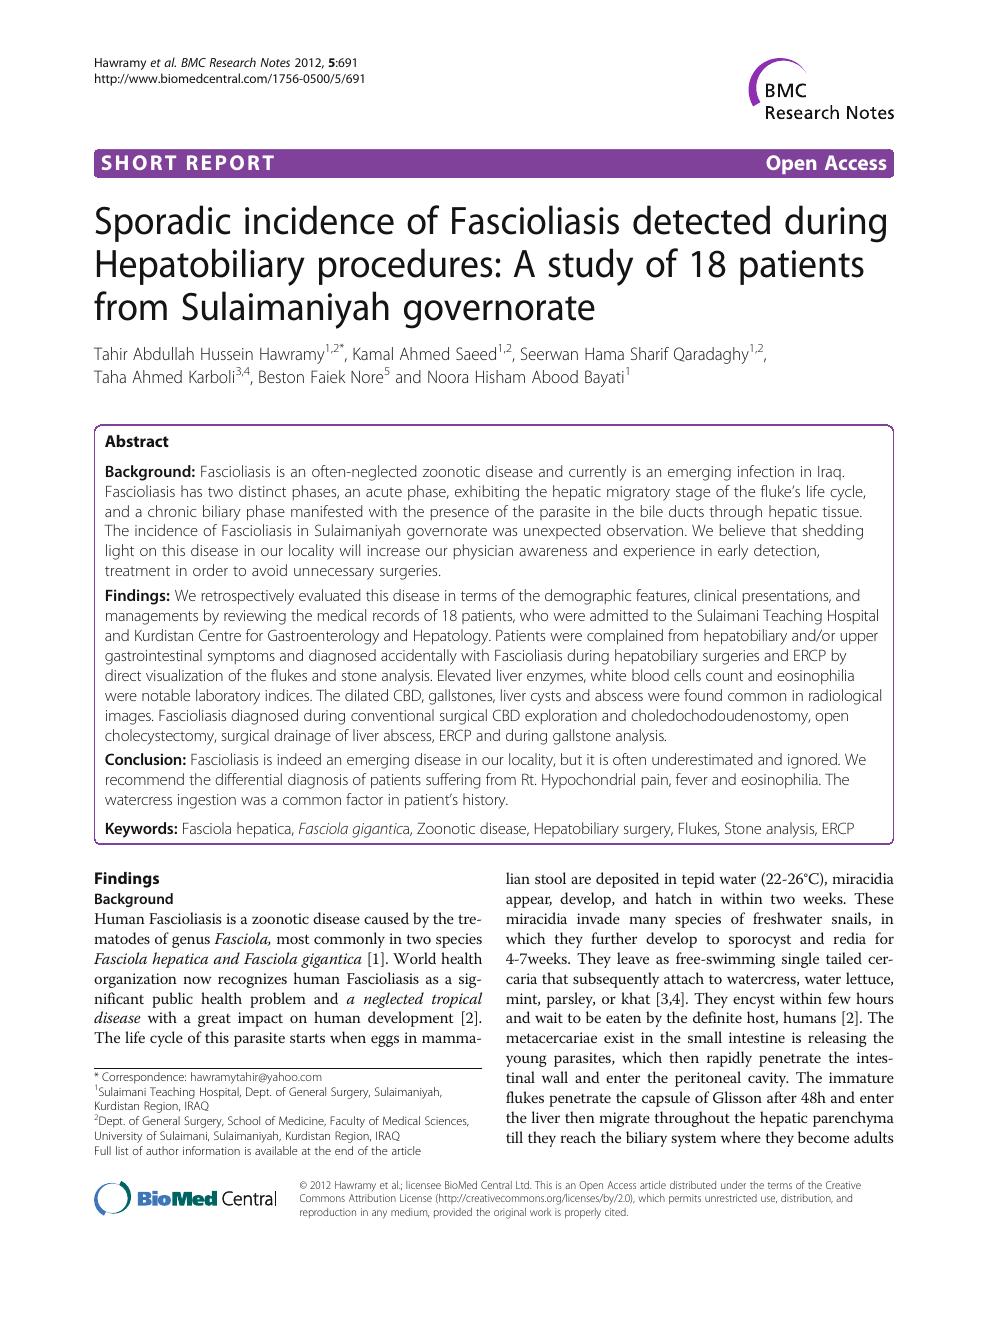 fascioliasis zoonosis